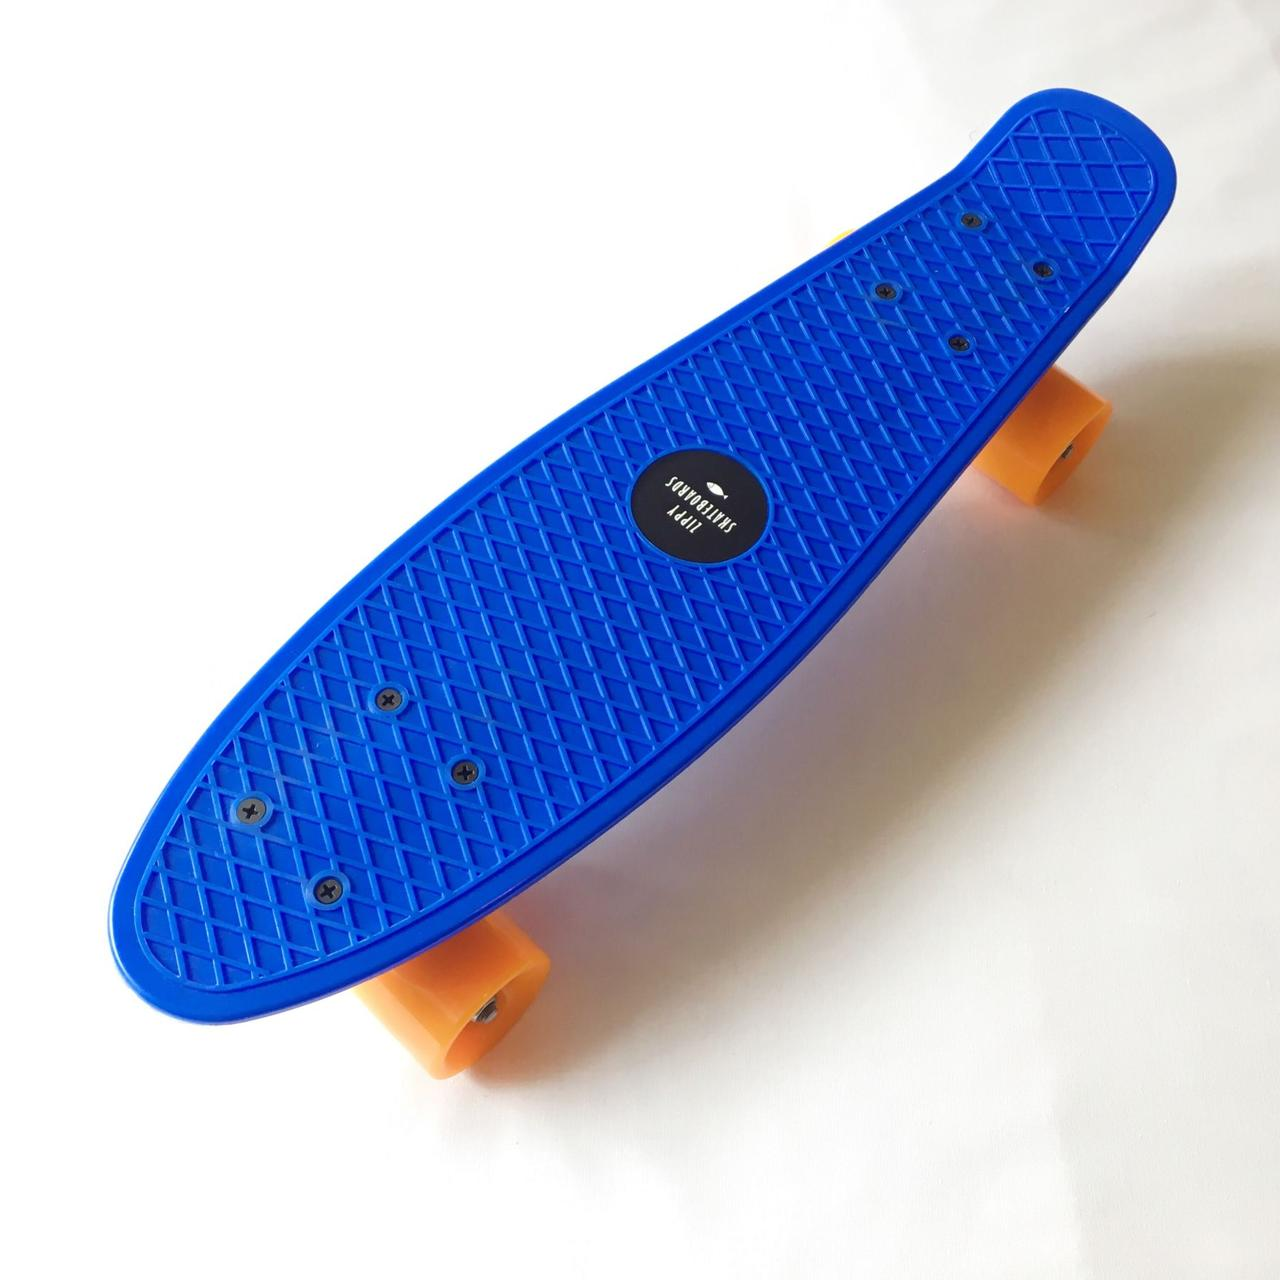 "Penny Blue Board 22"" - Синій 54 см пенні борд"